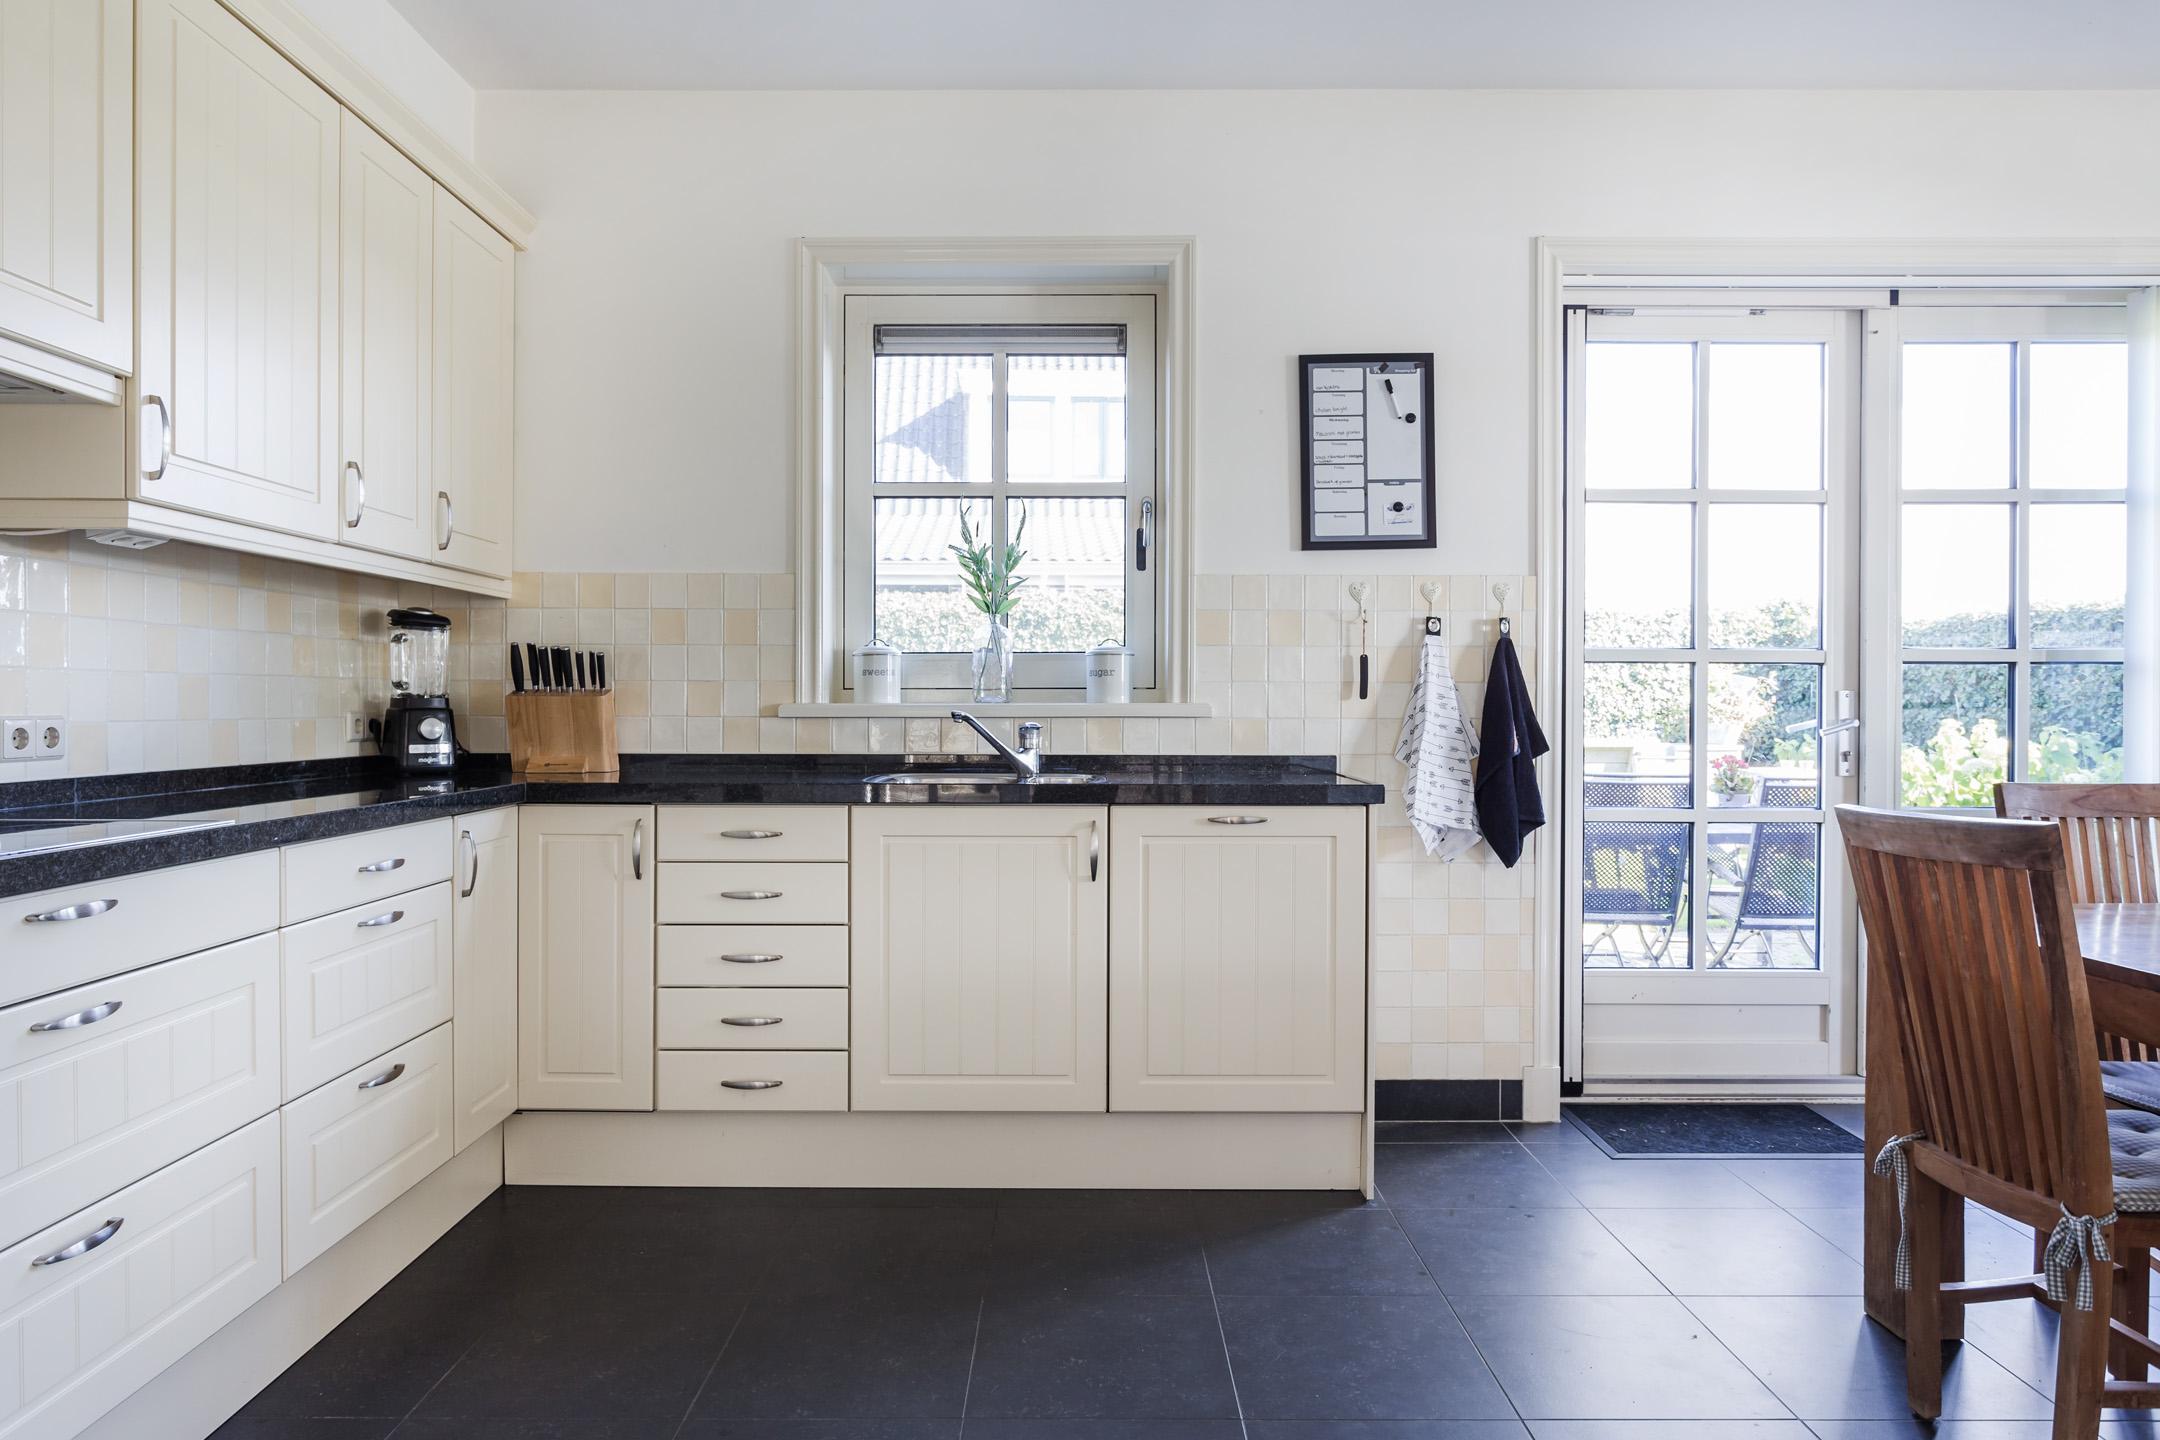 Keuken Landelijk Ramen : Moderne keukens das keukens